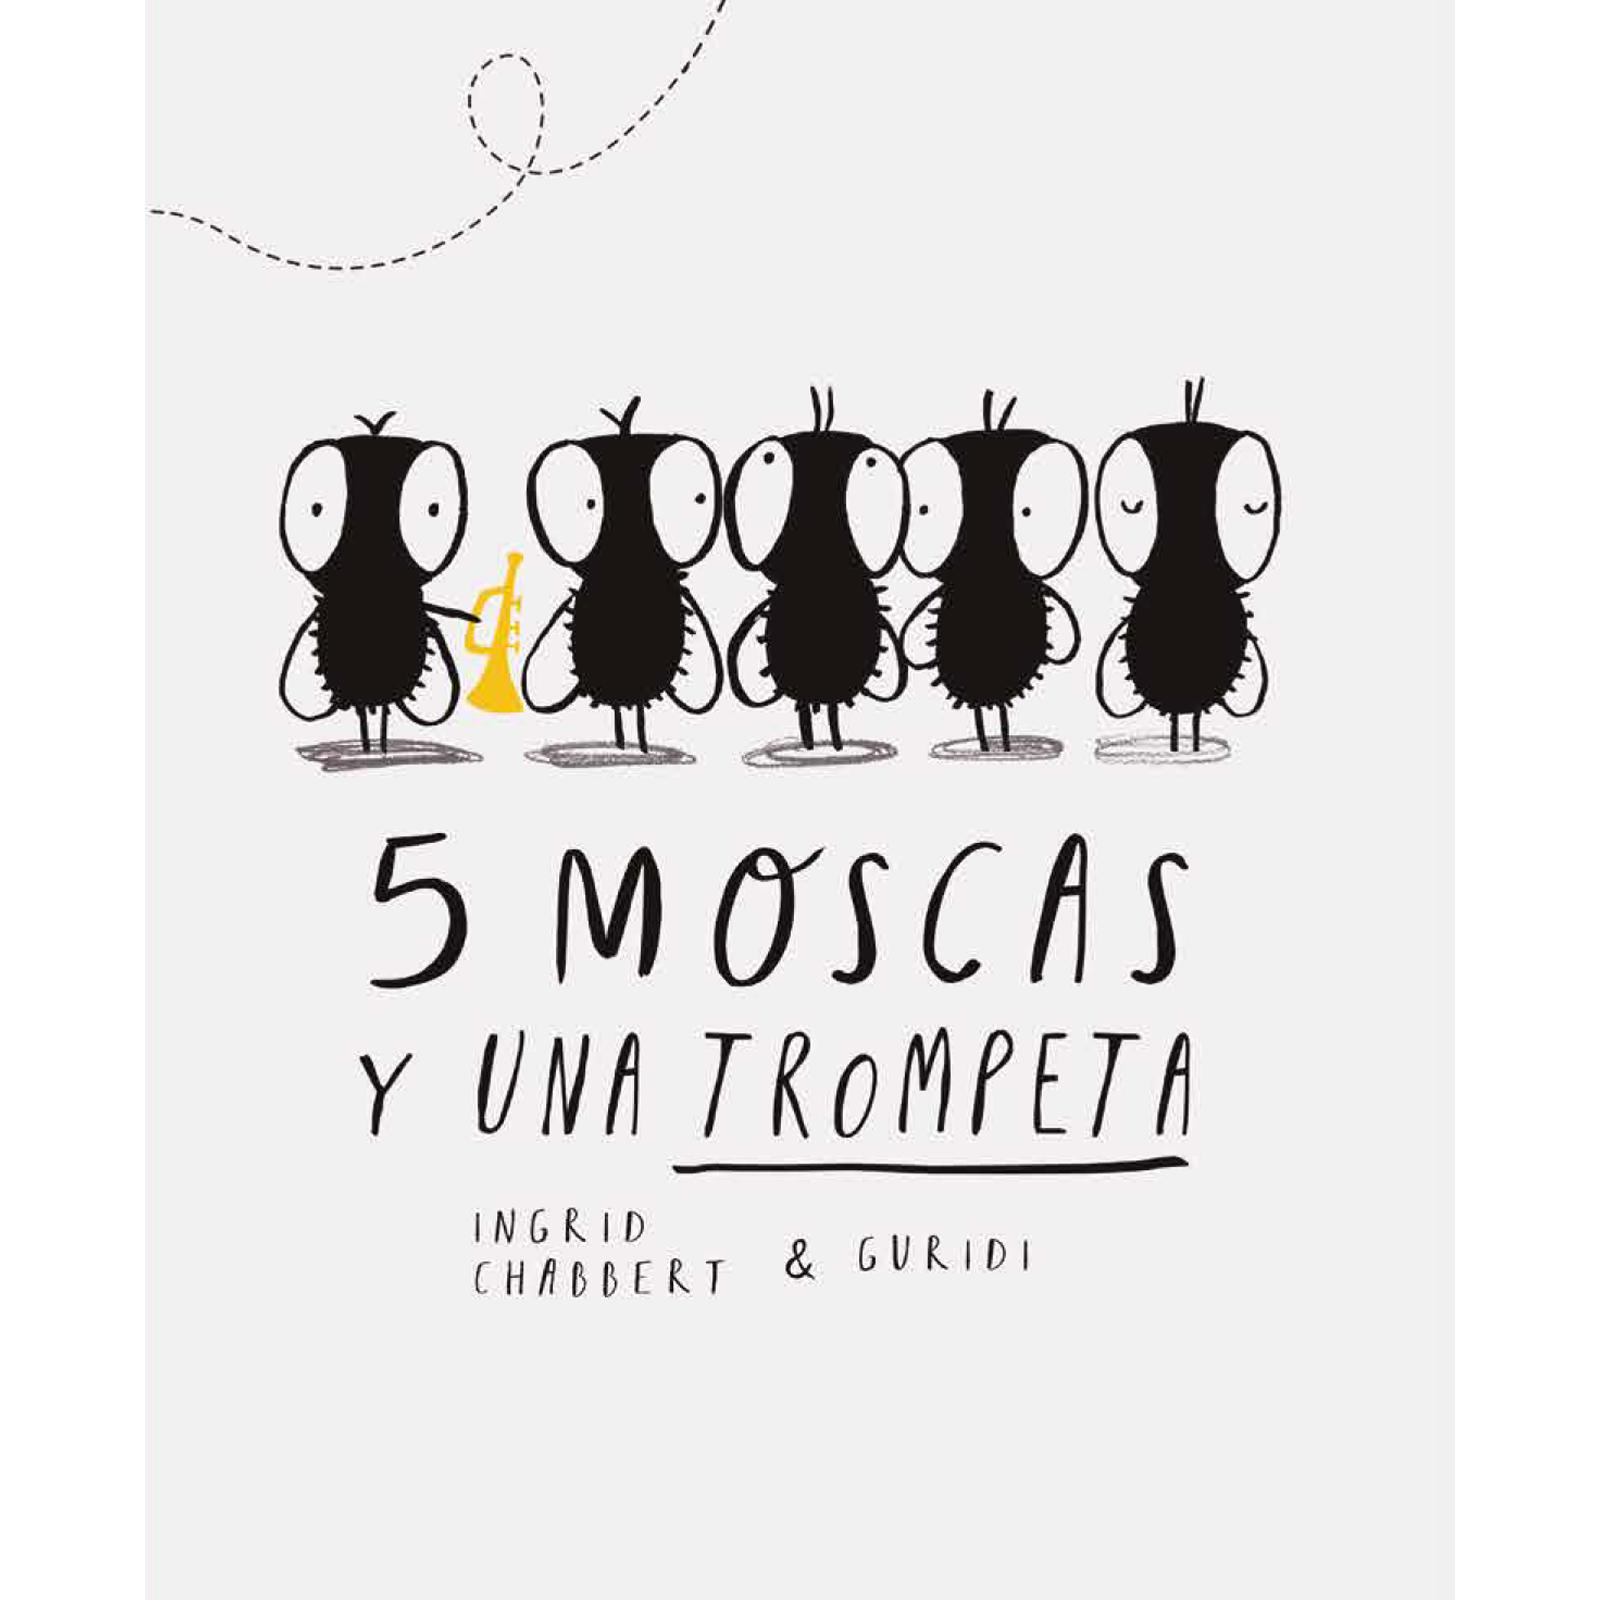 5 moscas